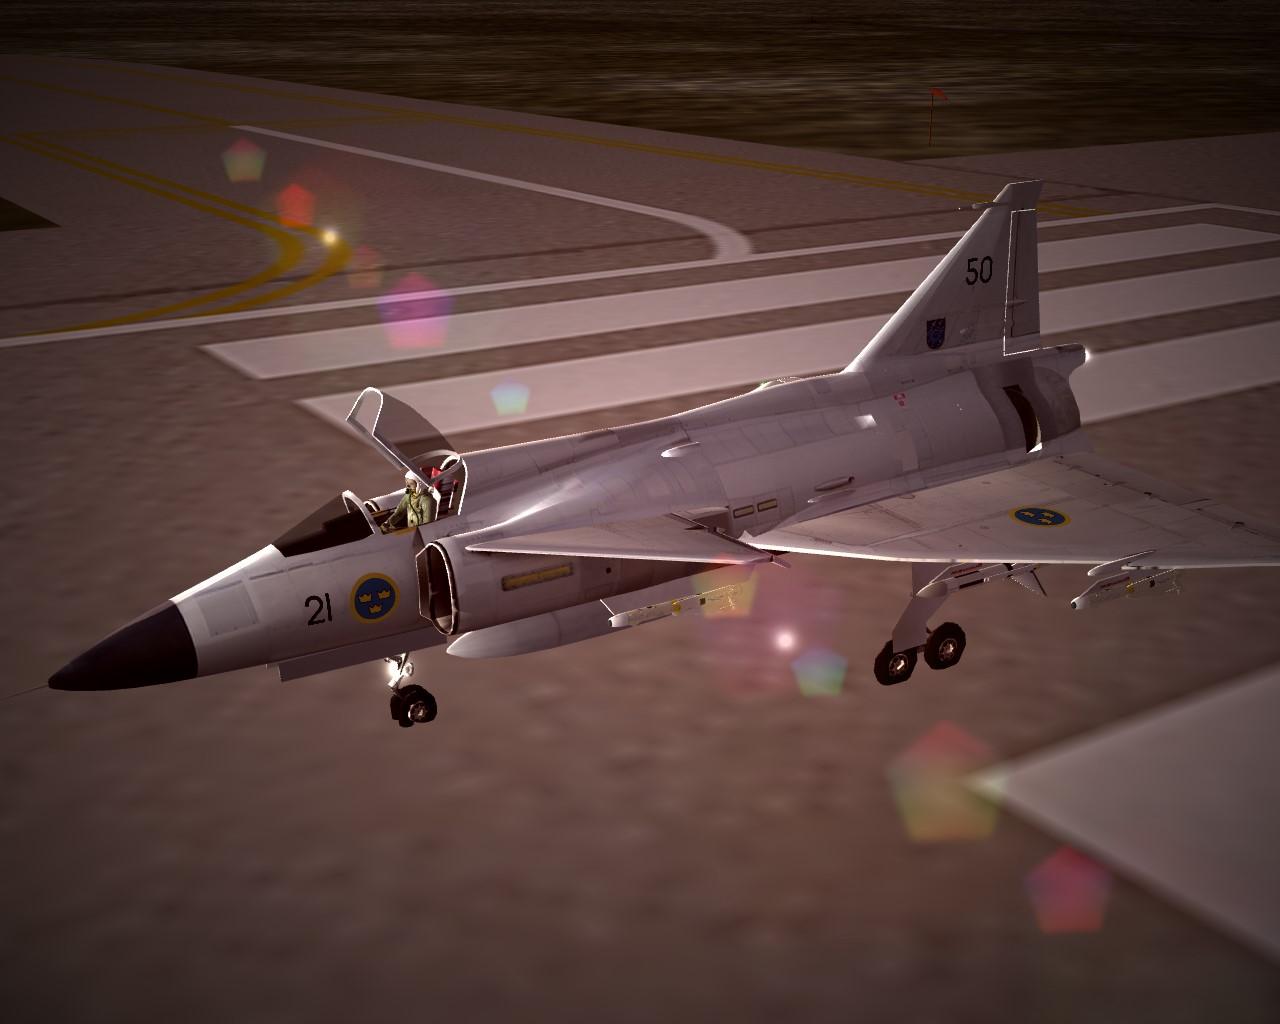 SF2_JA-37_PhotorealisticBeraMetal